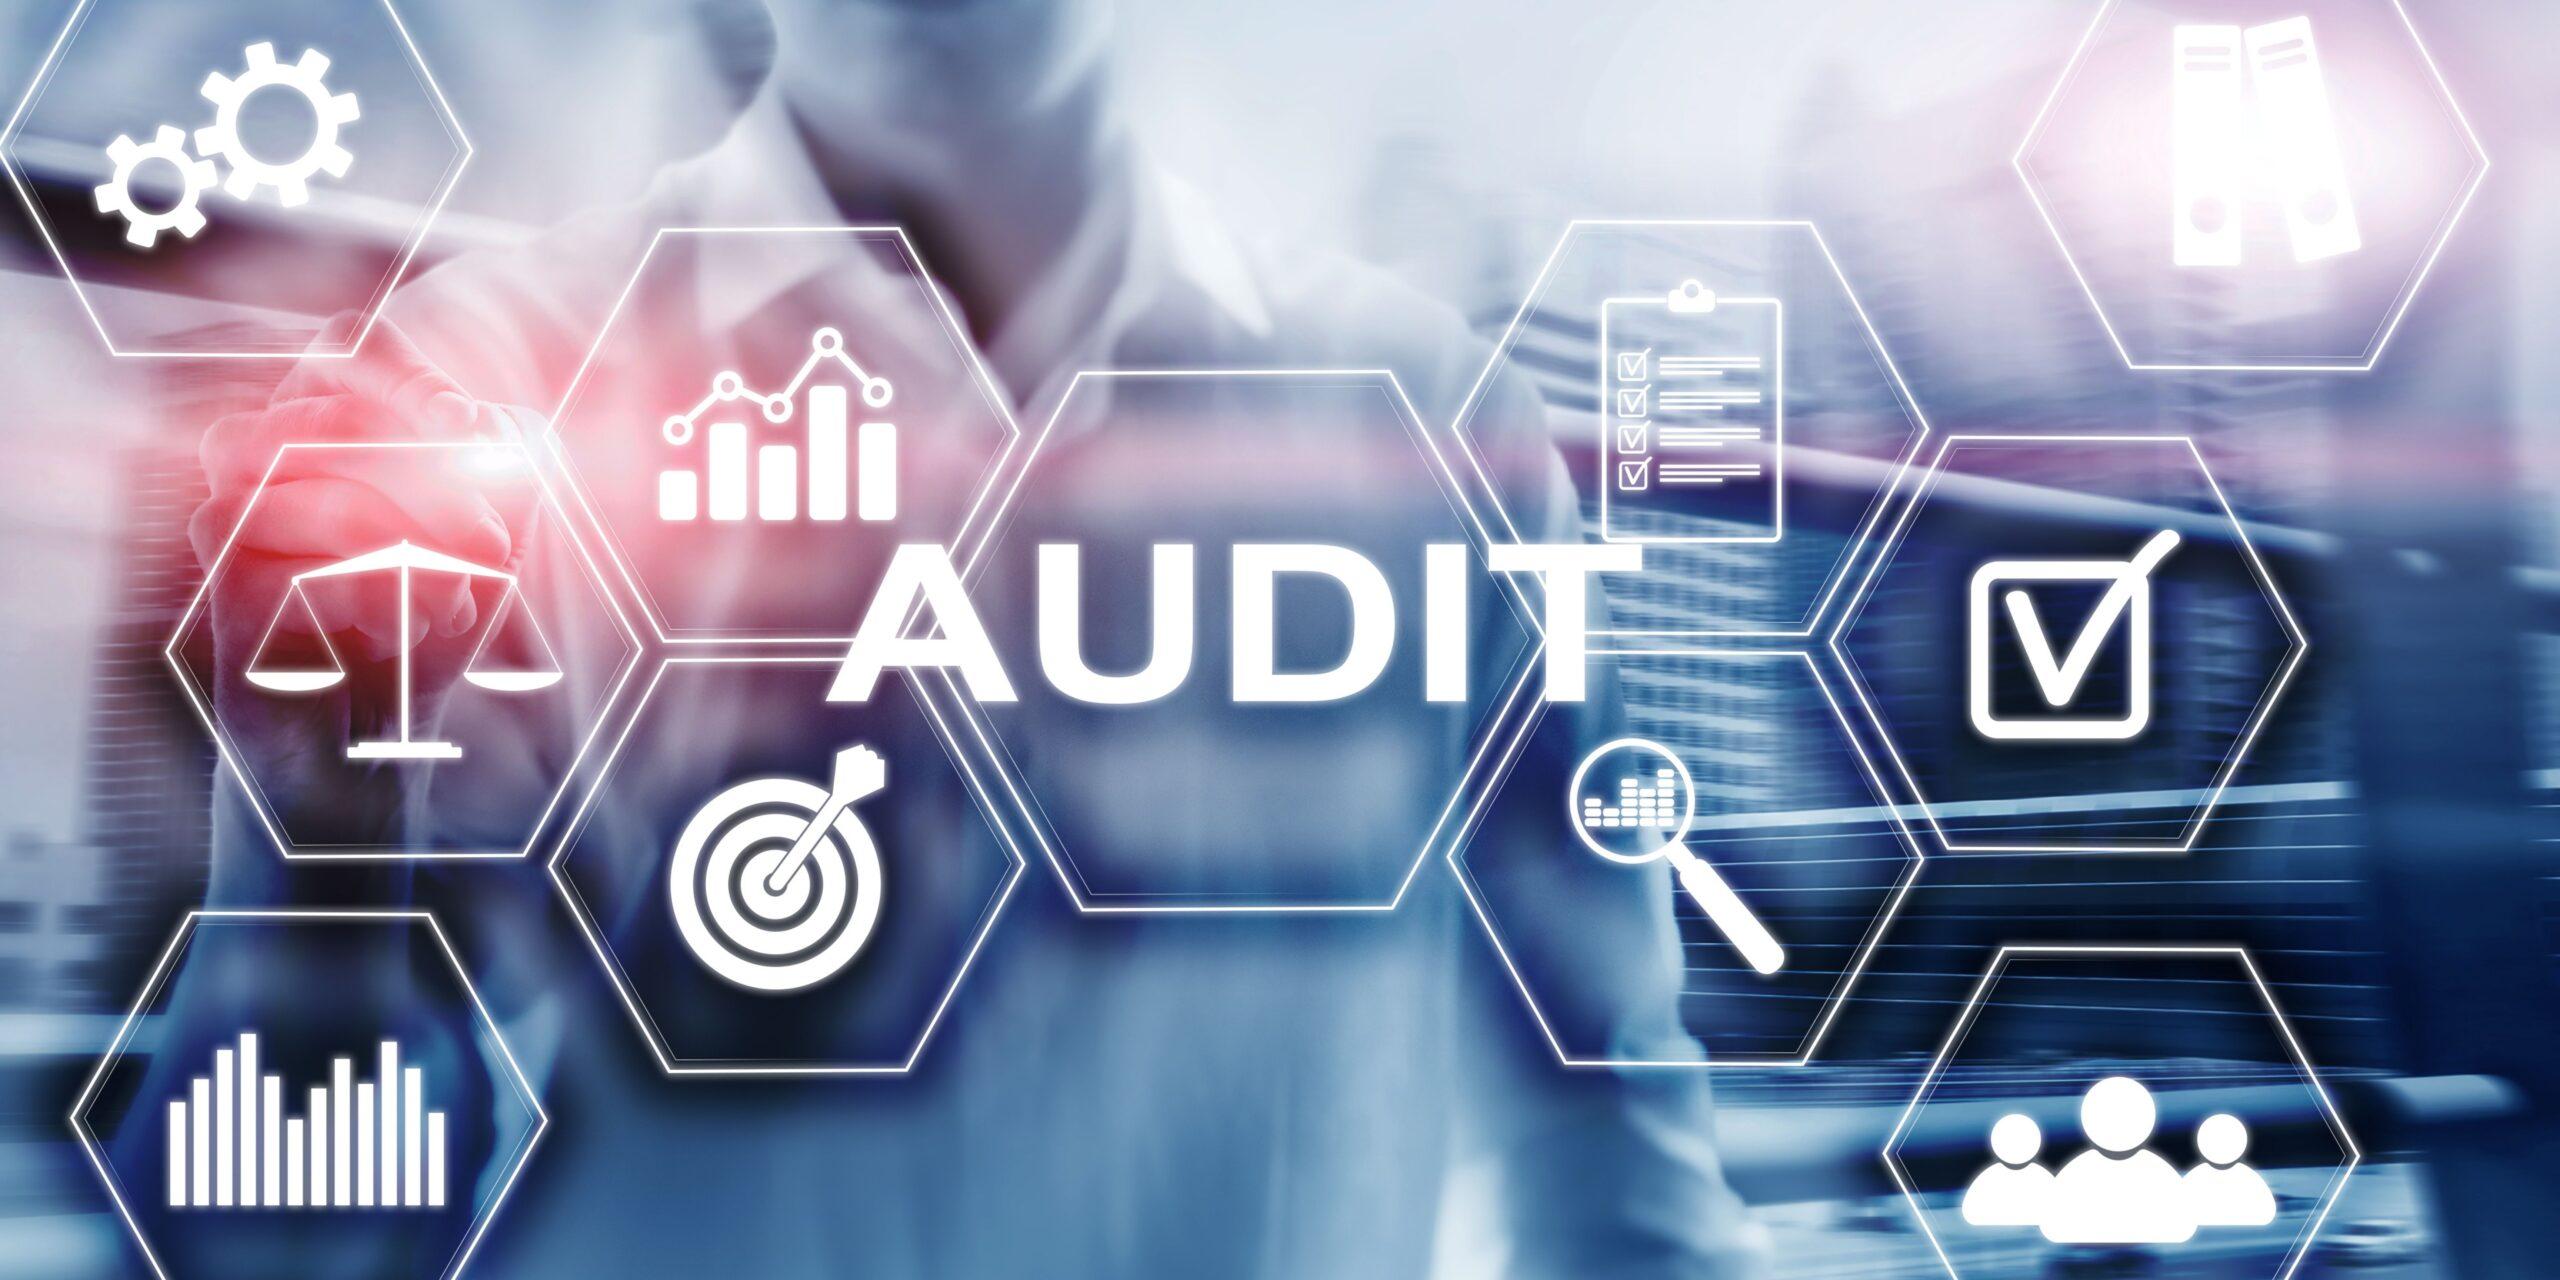 Auditoria - Ethical Strategists